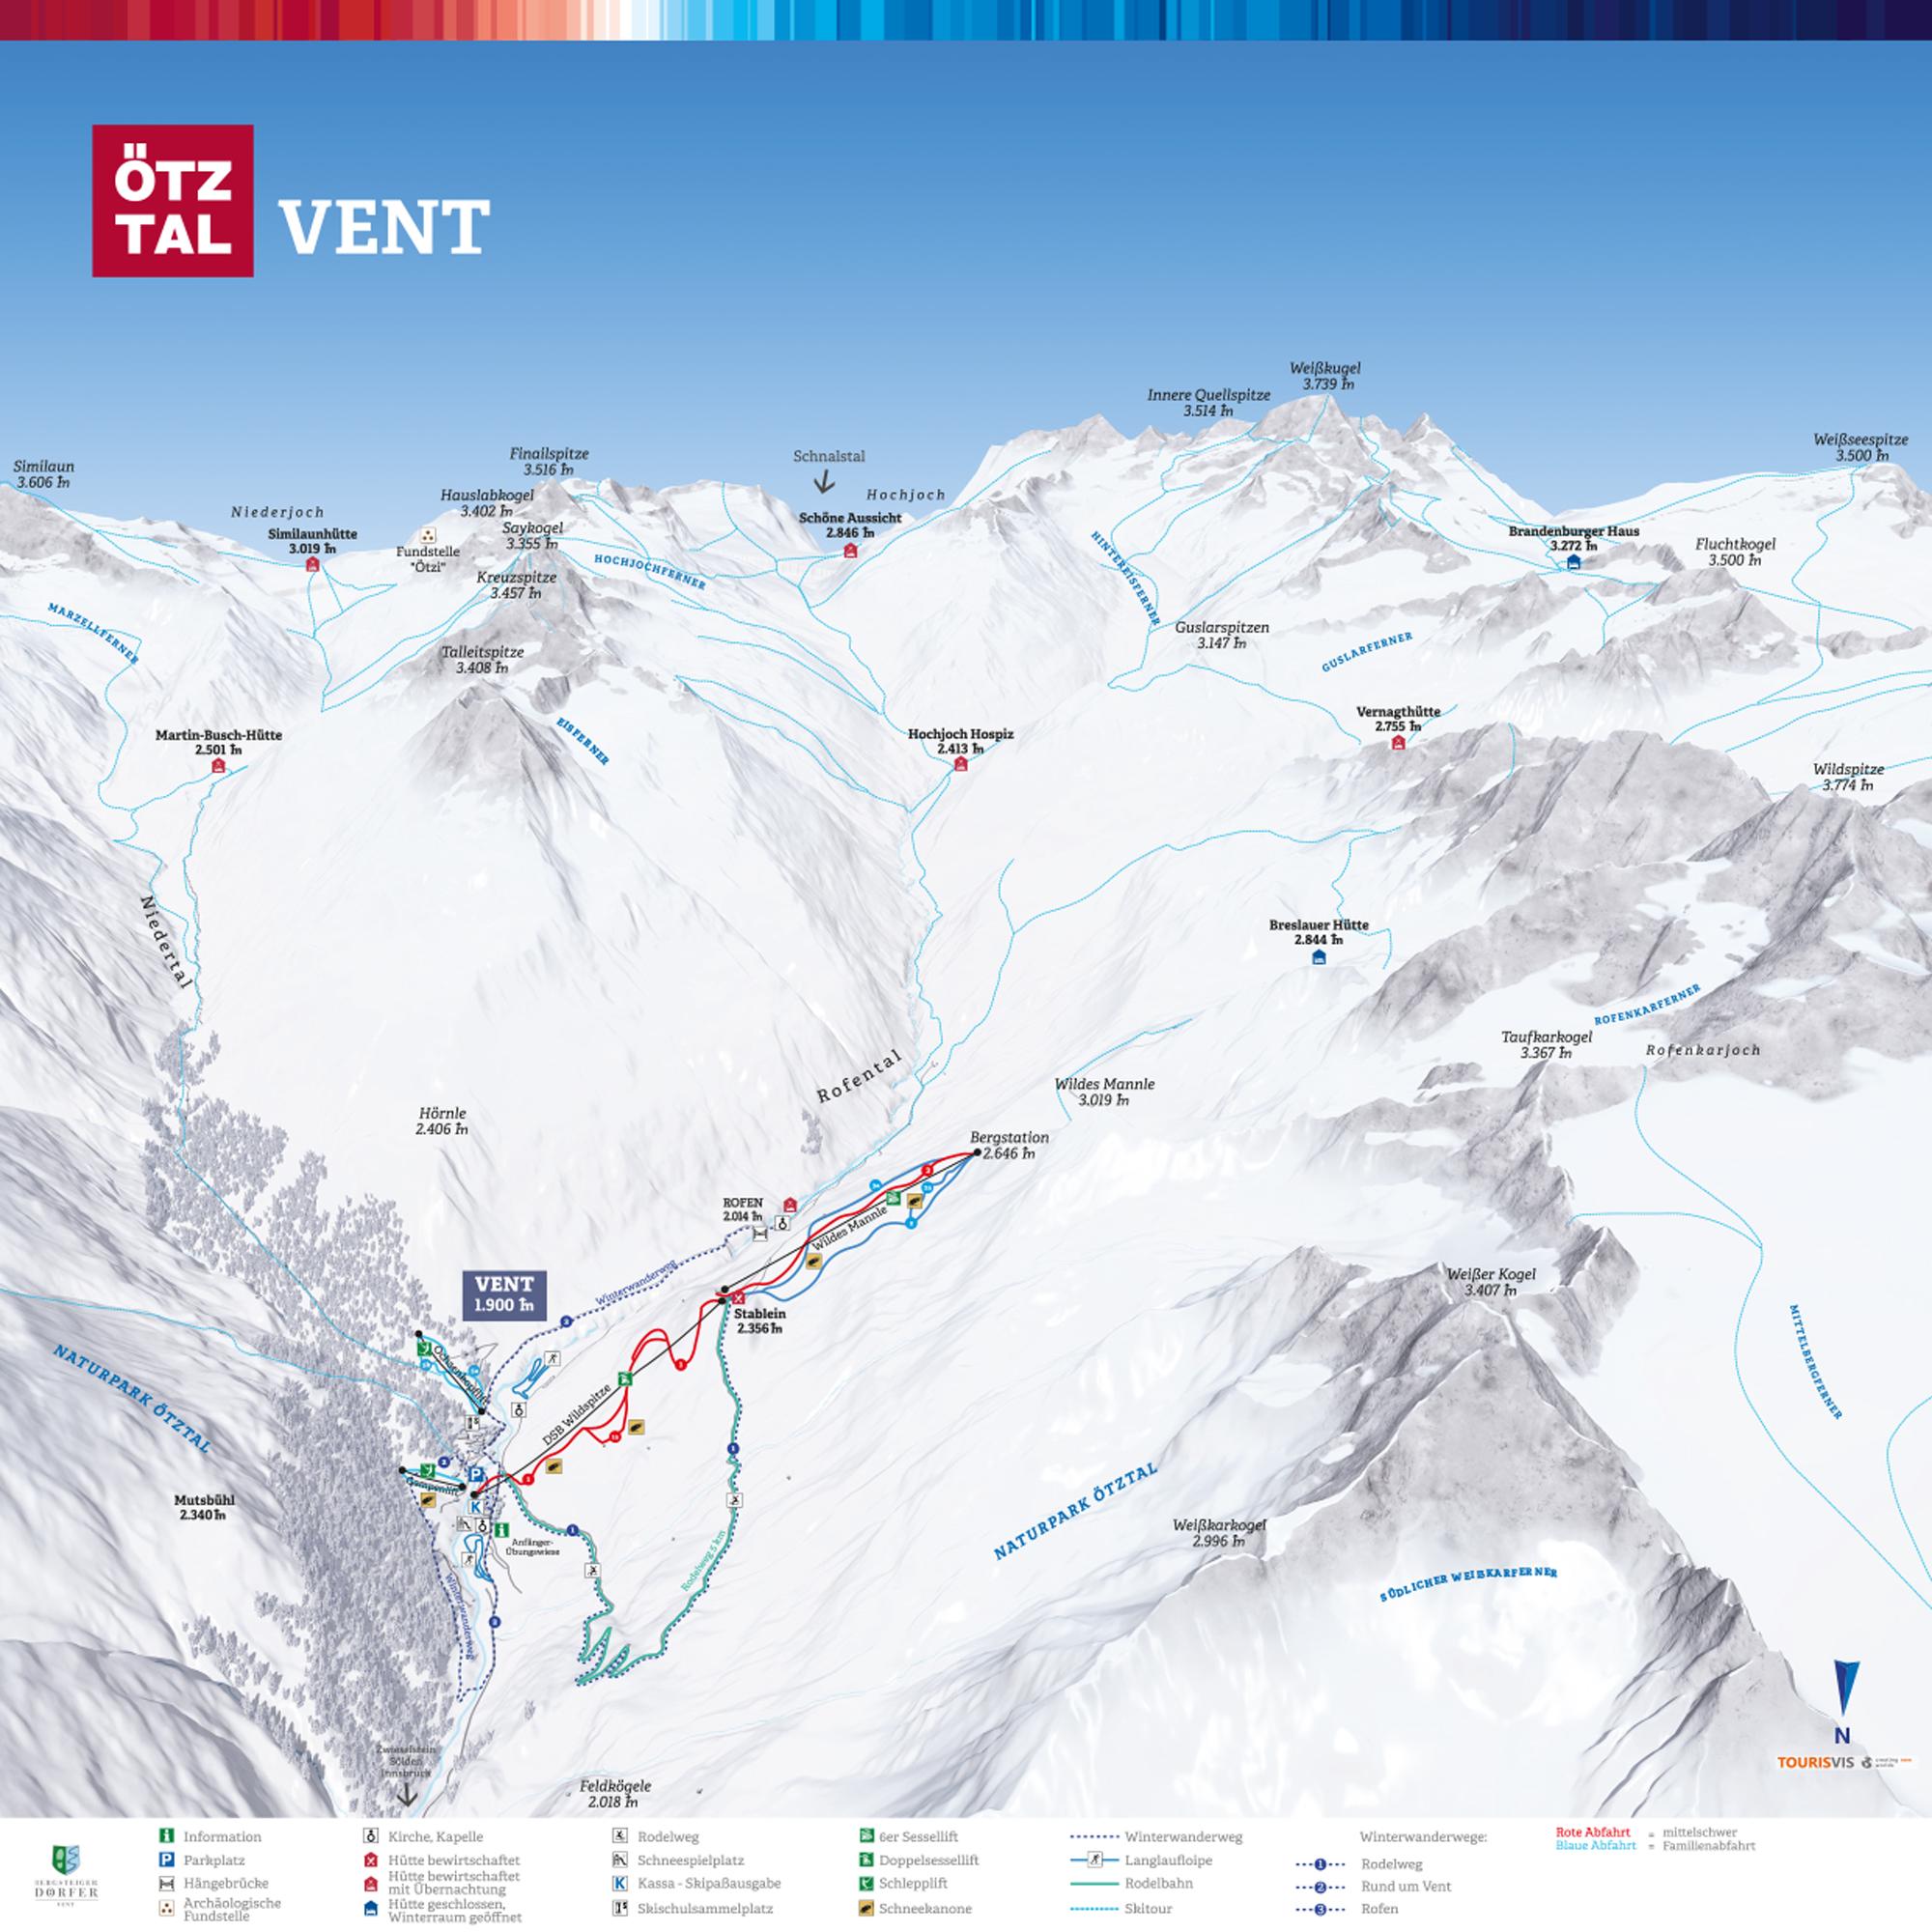 3D Panoramakarte Winterpanorama Vent Oetztal